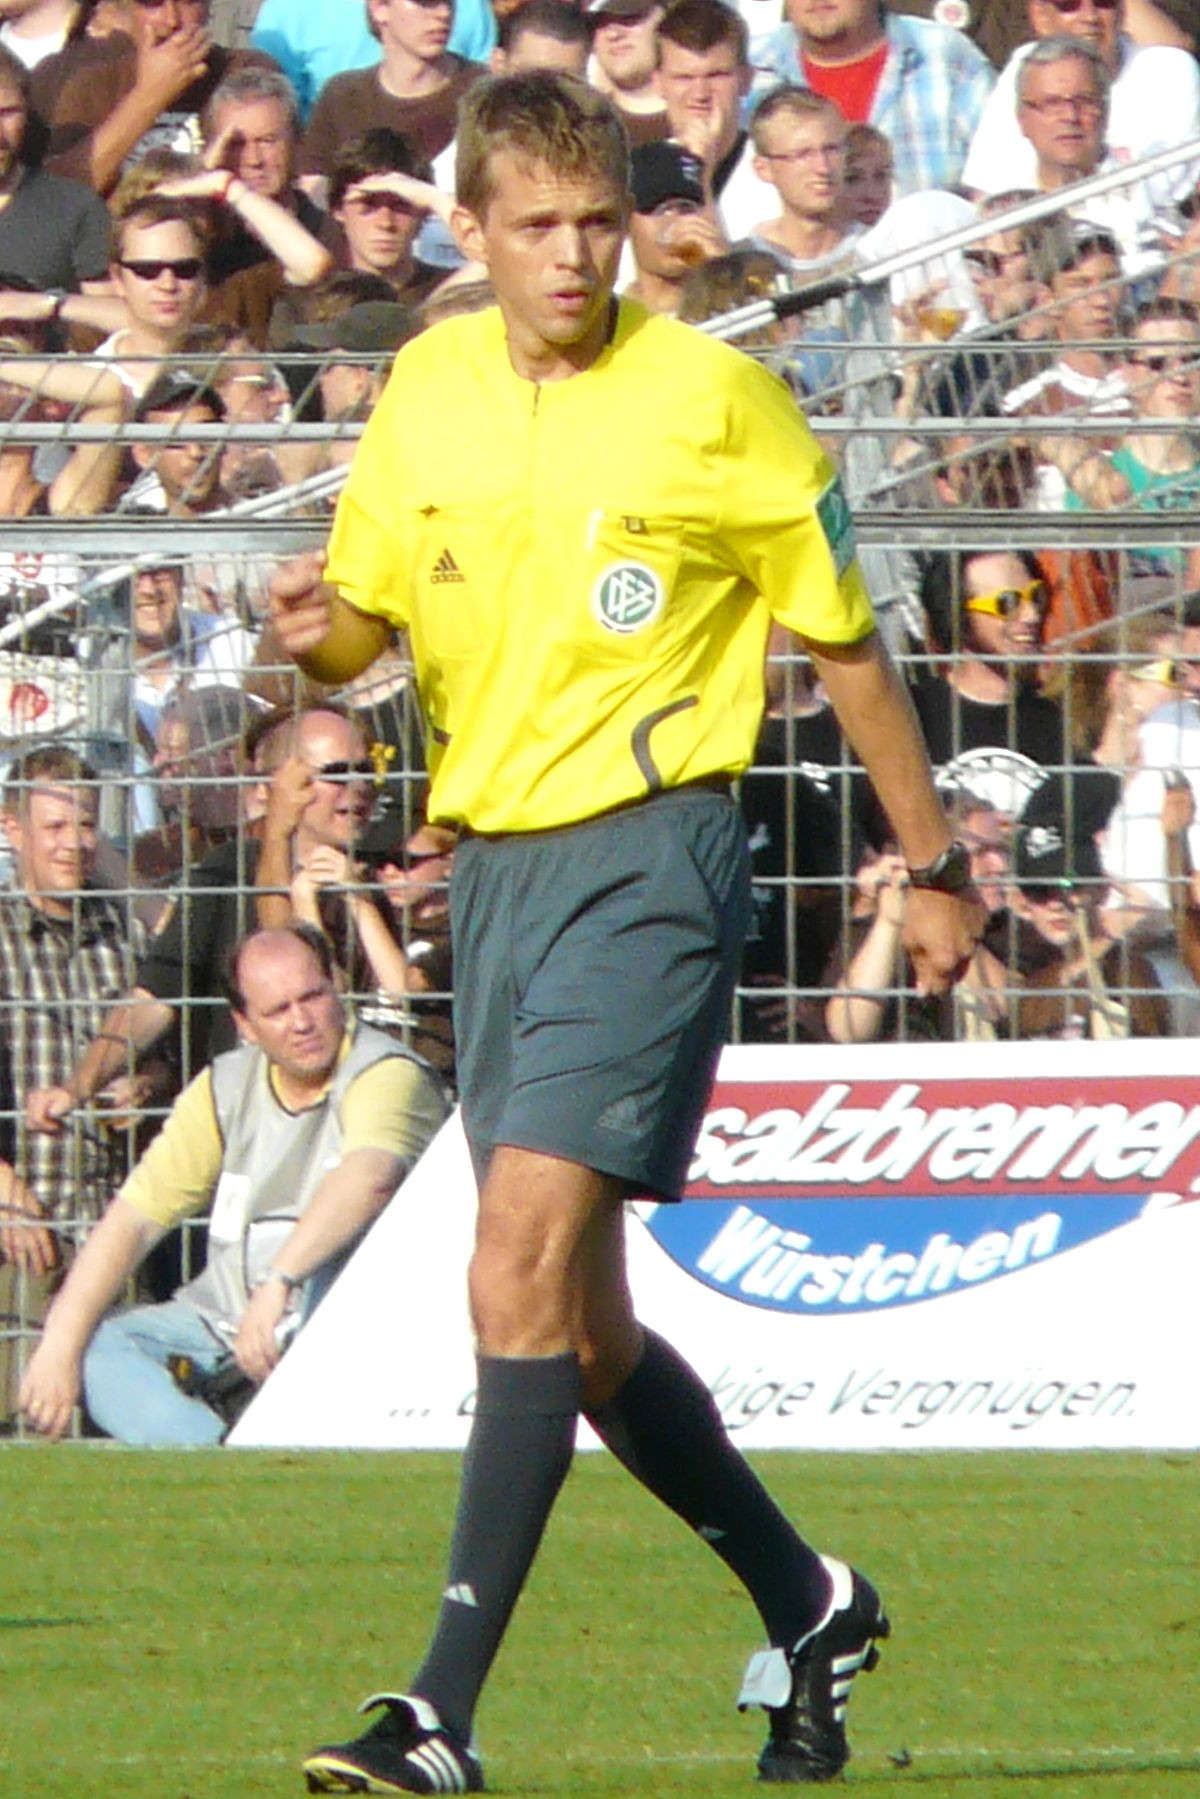 Jochen Drees